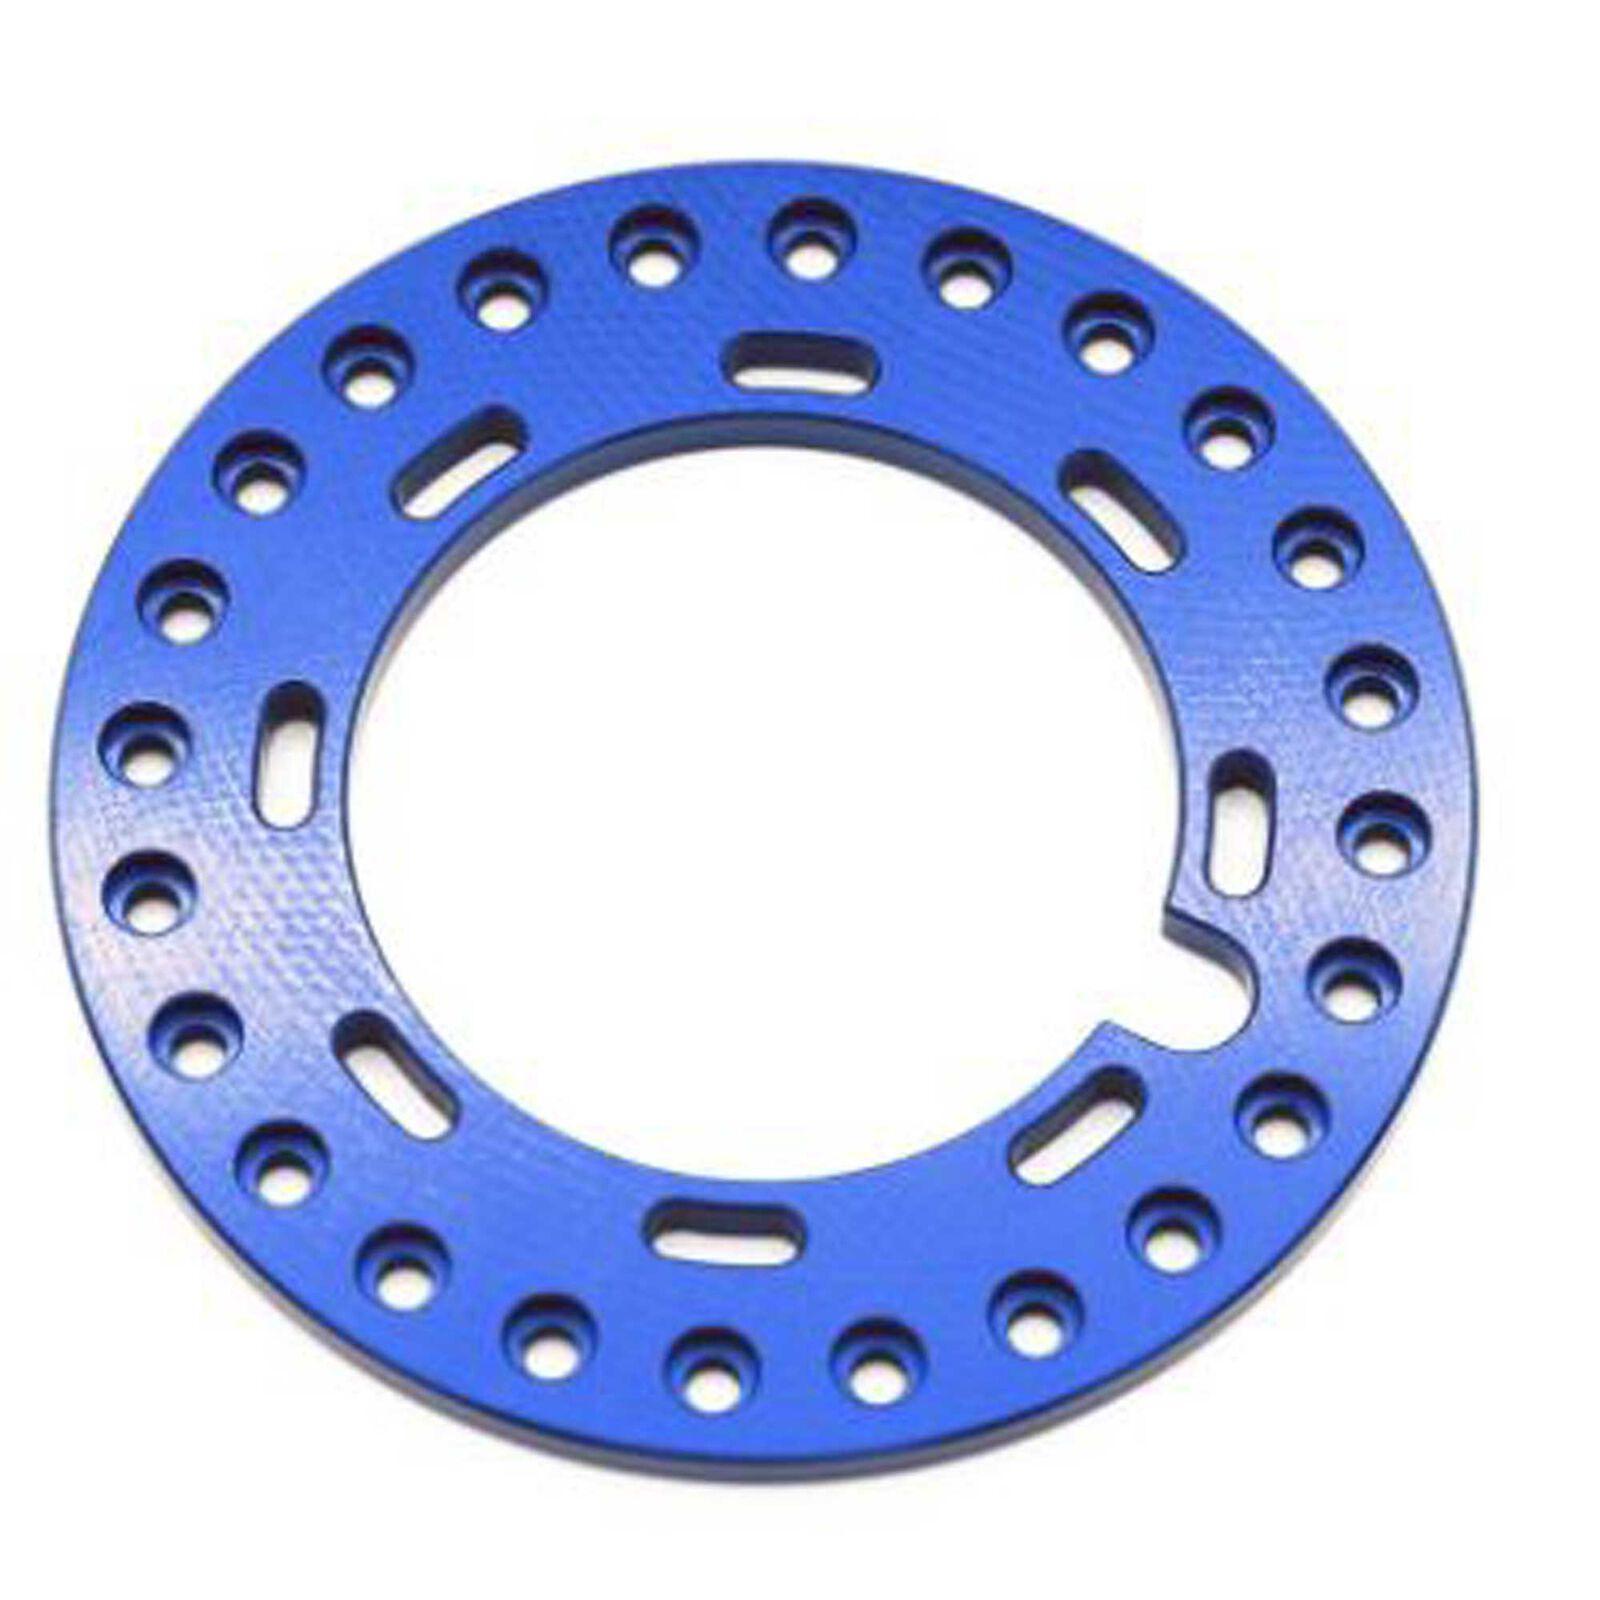 1.9 IBTR Beadlock Blue Anodized